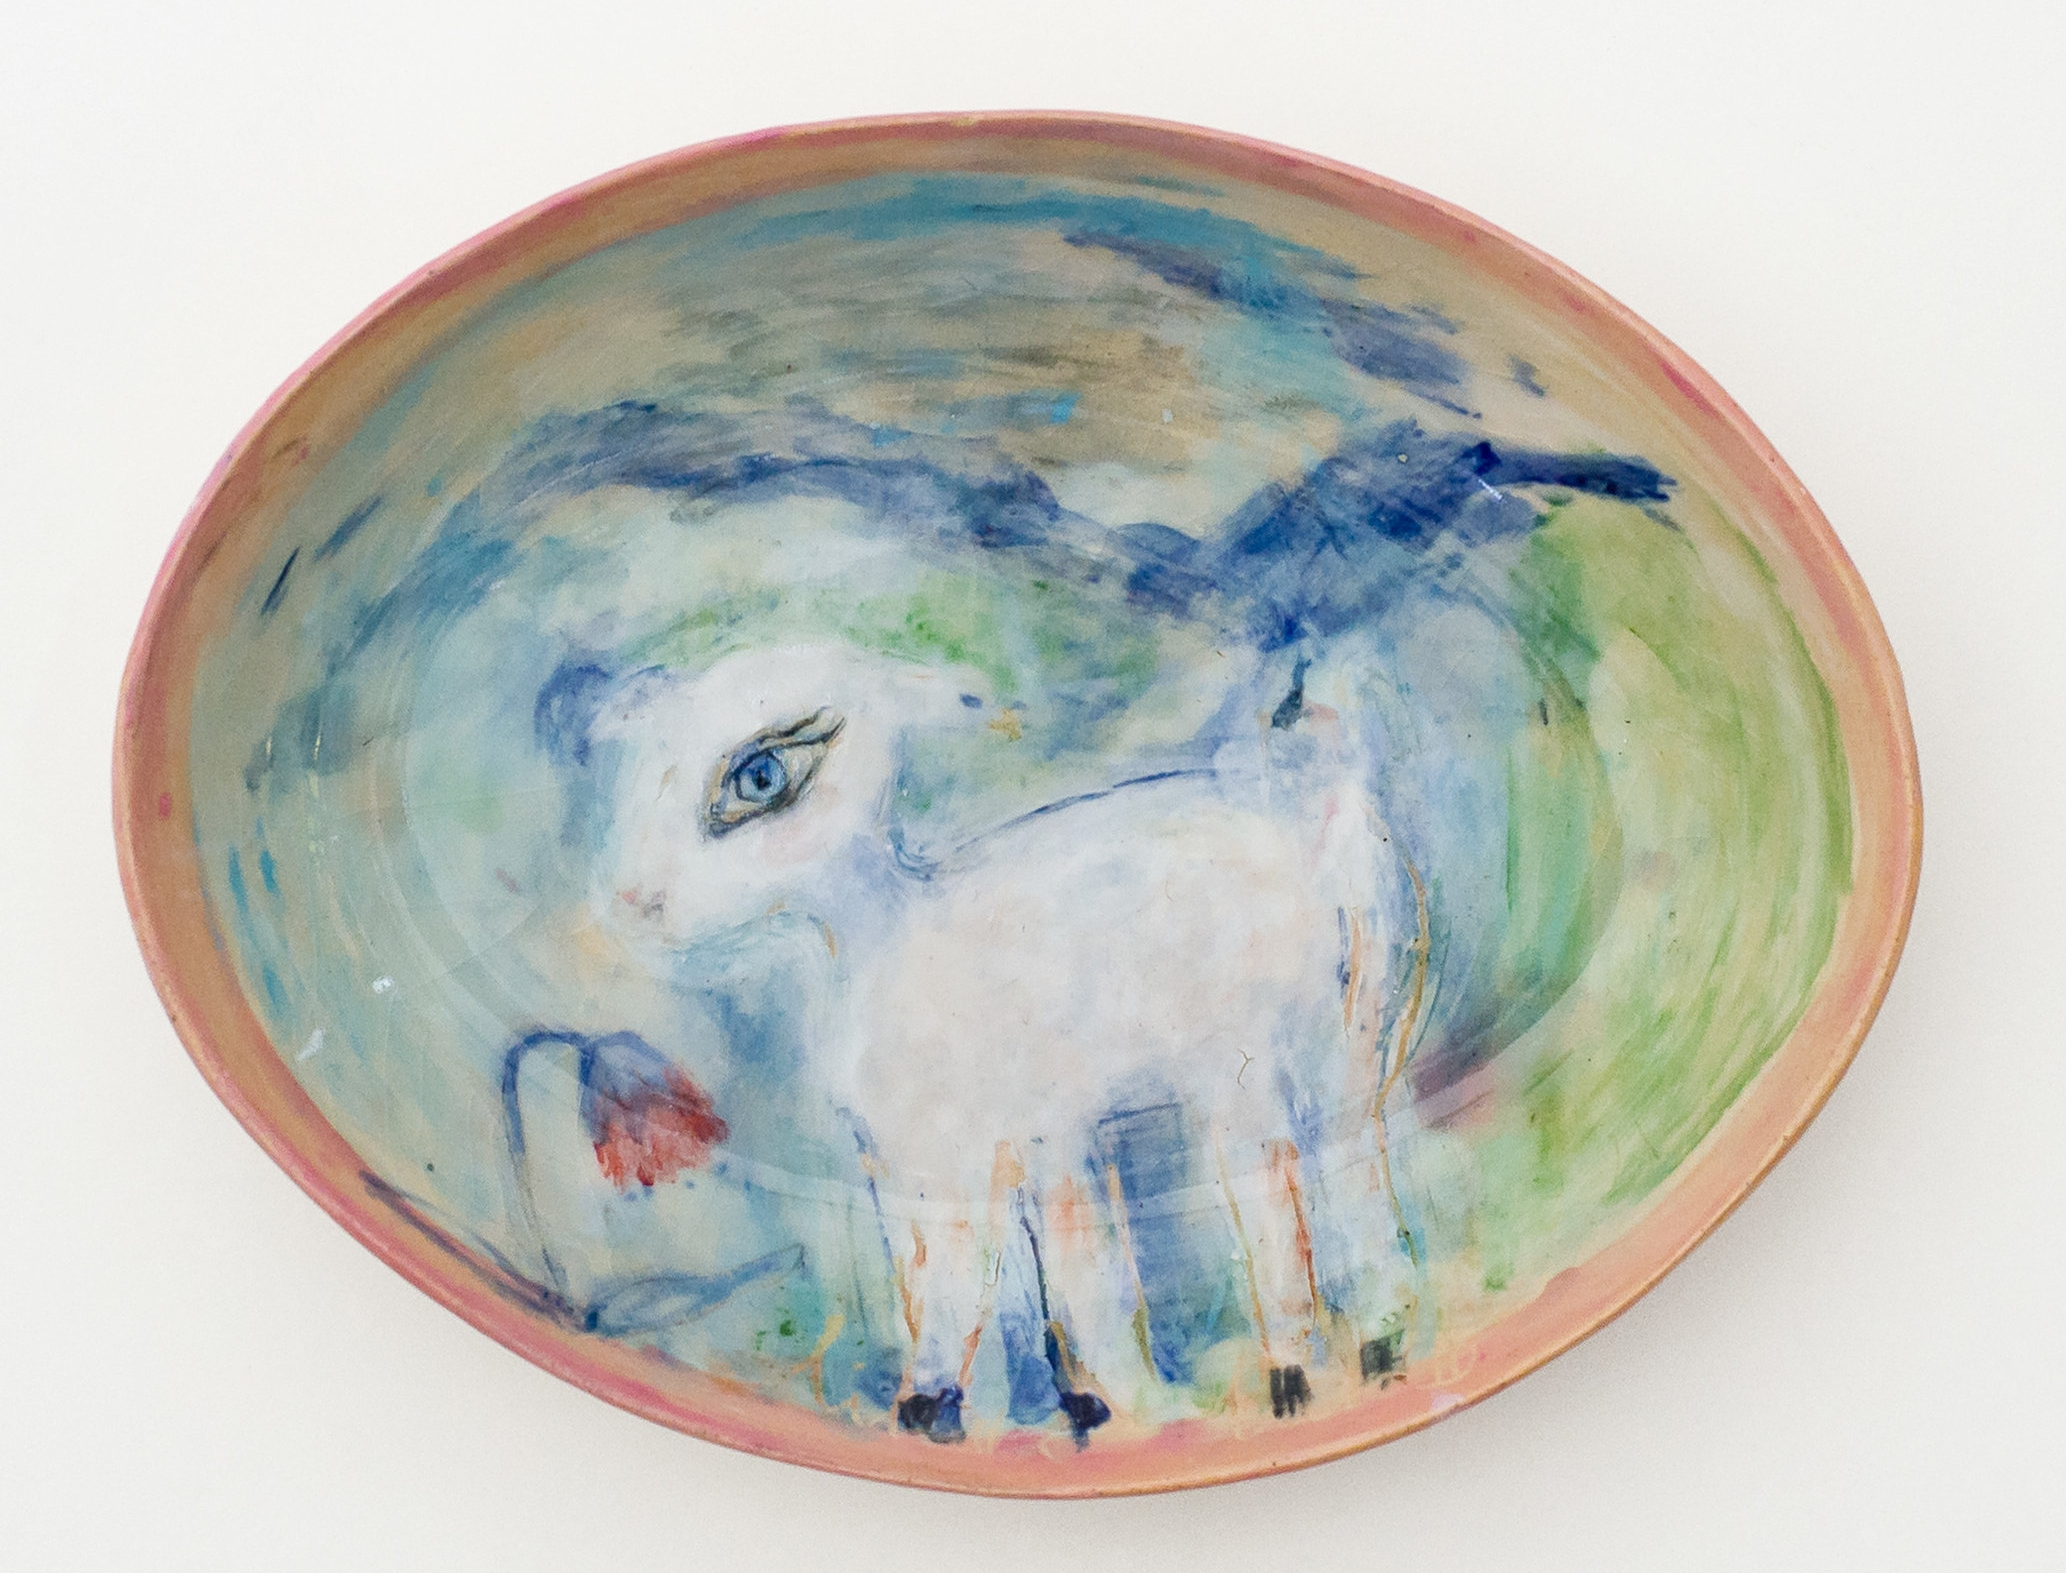 Julie Goldsmith_series of plates_)ct 2017-12664_v2.jpg